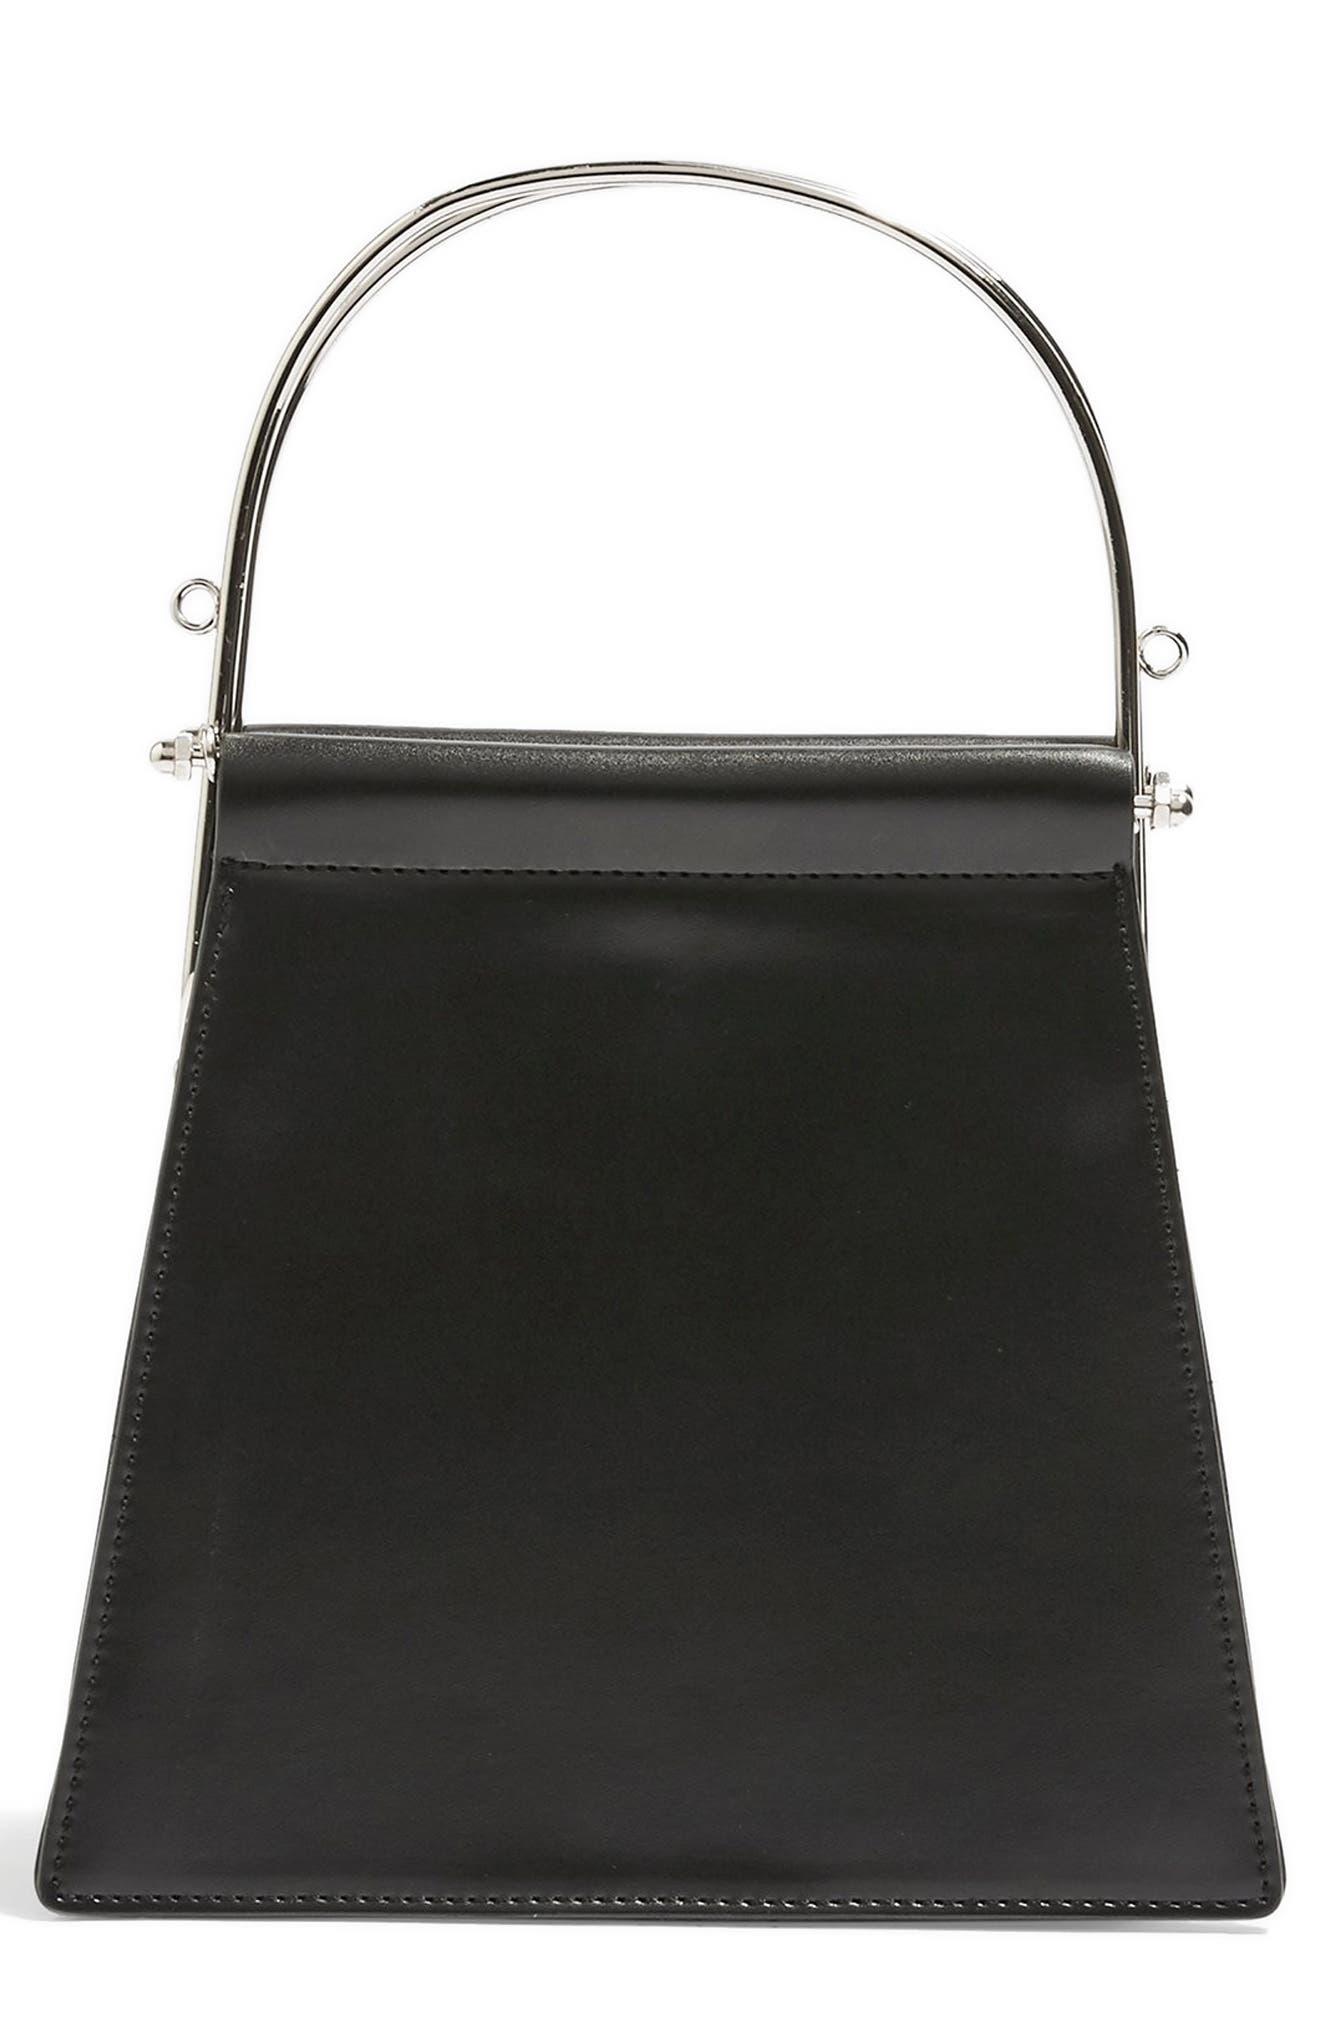 TOPSHOP Lola Top Handle Bag, Main, color, BLACK